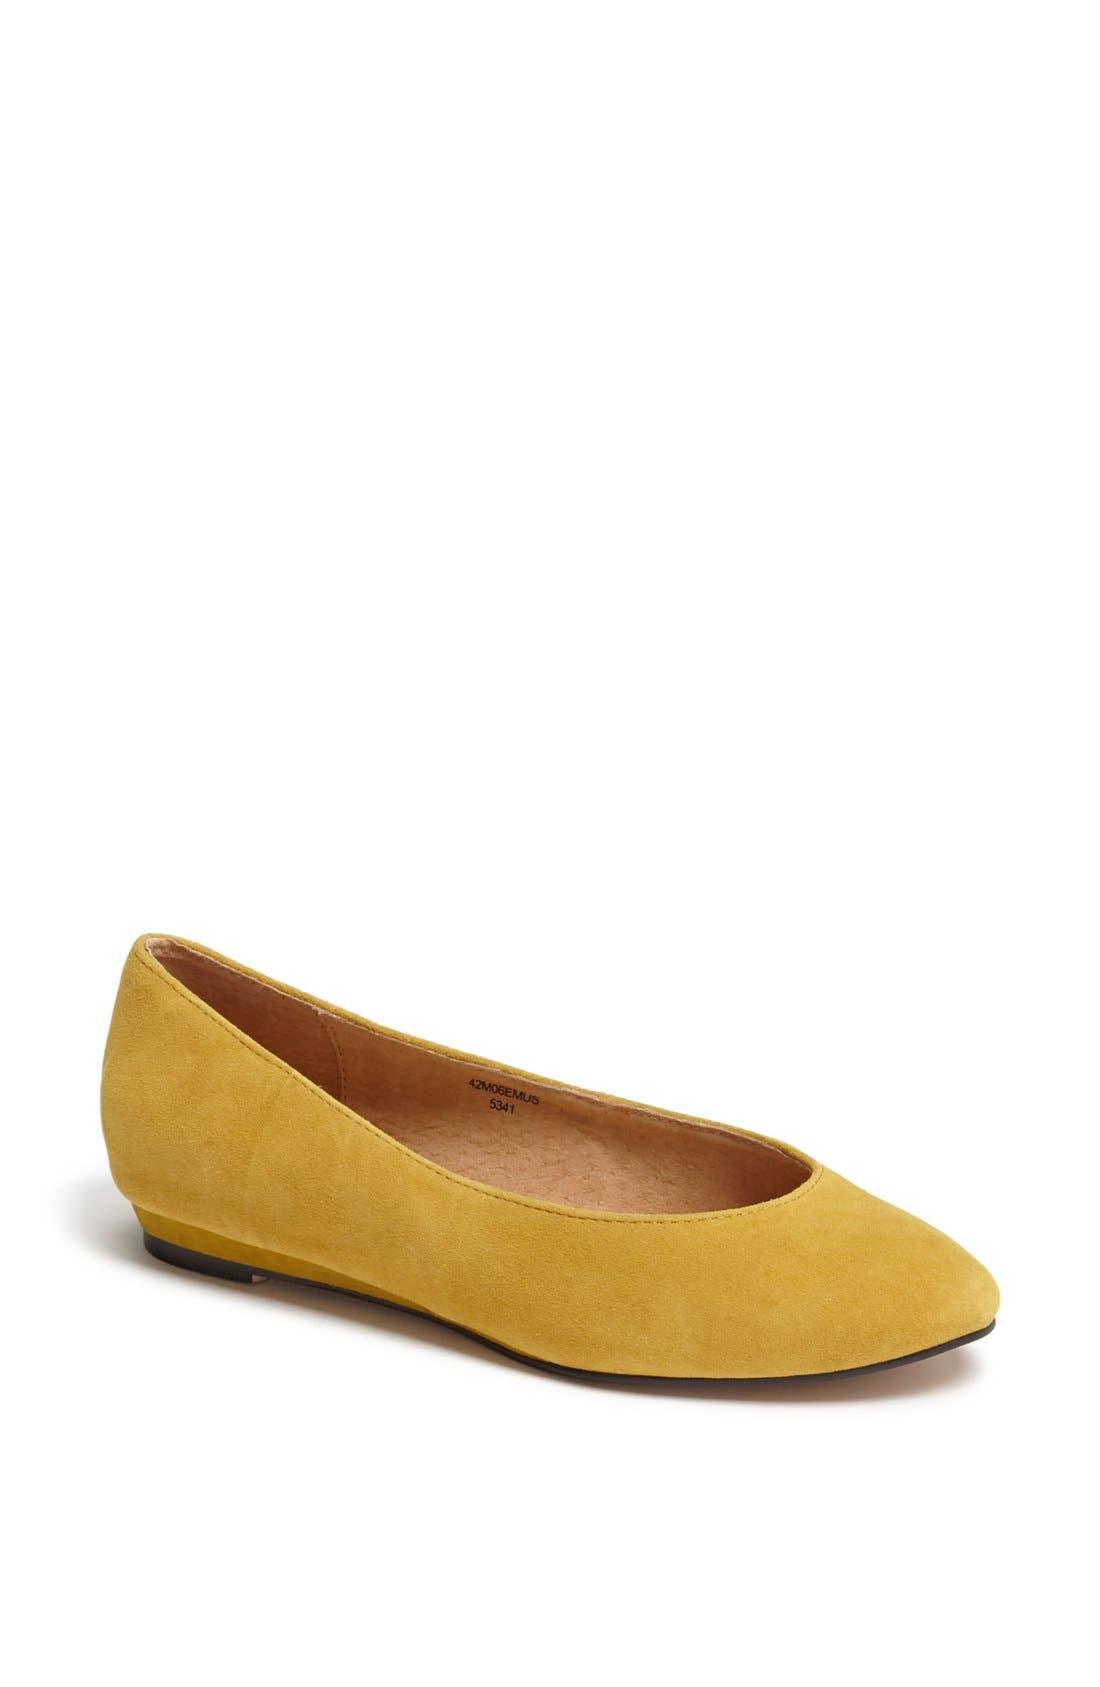 'Mello Mini Wedge' Court Shoe,                             Main thumbnail 1, color,                             Mustard